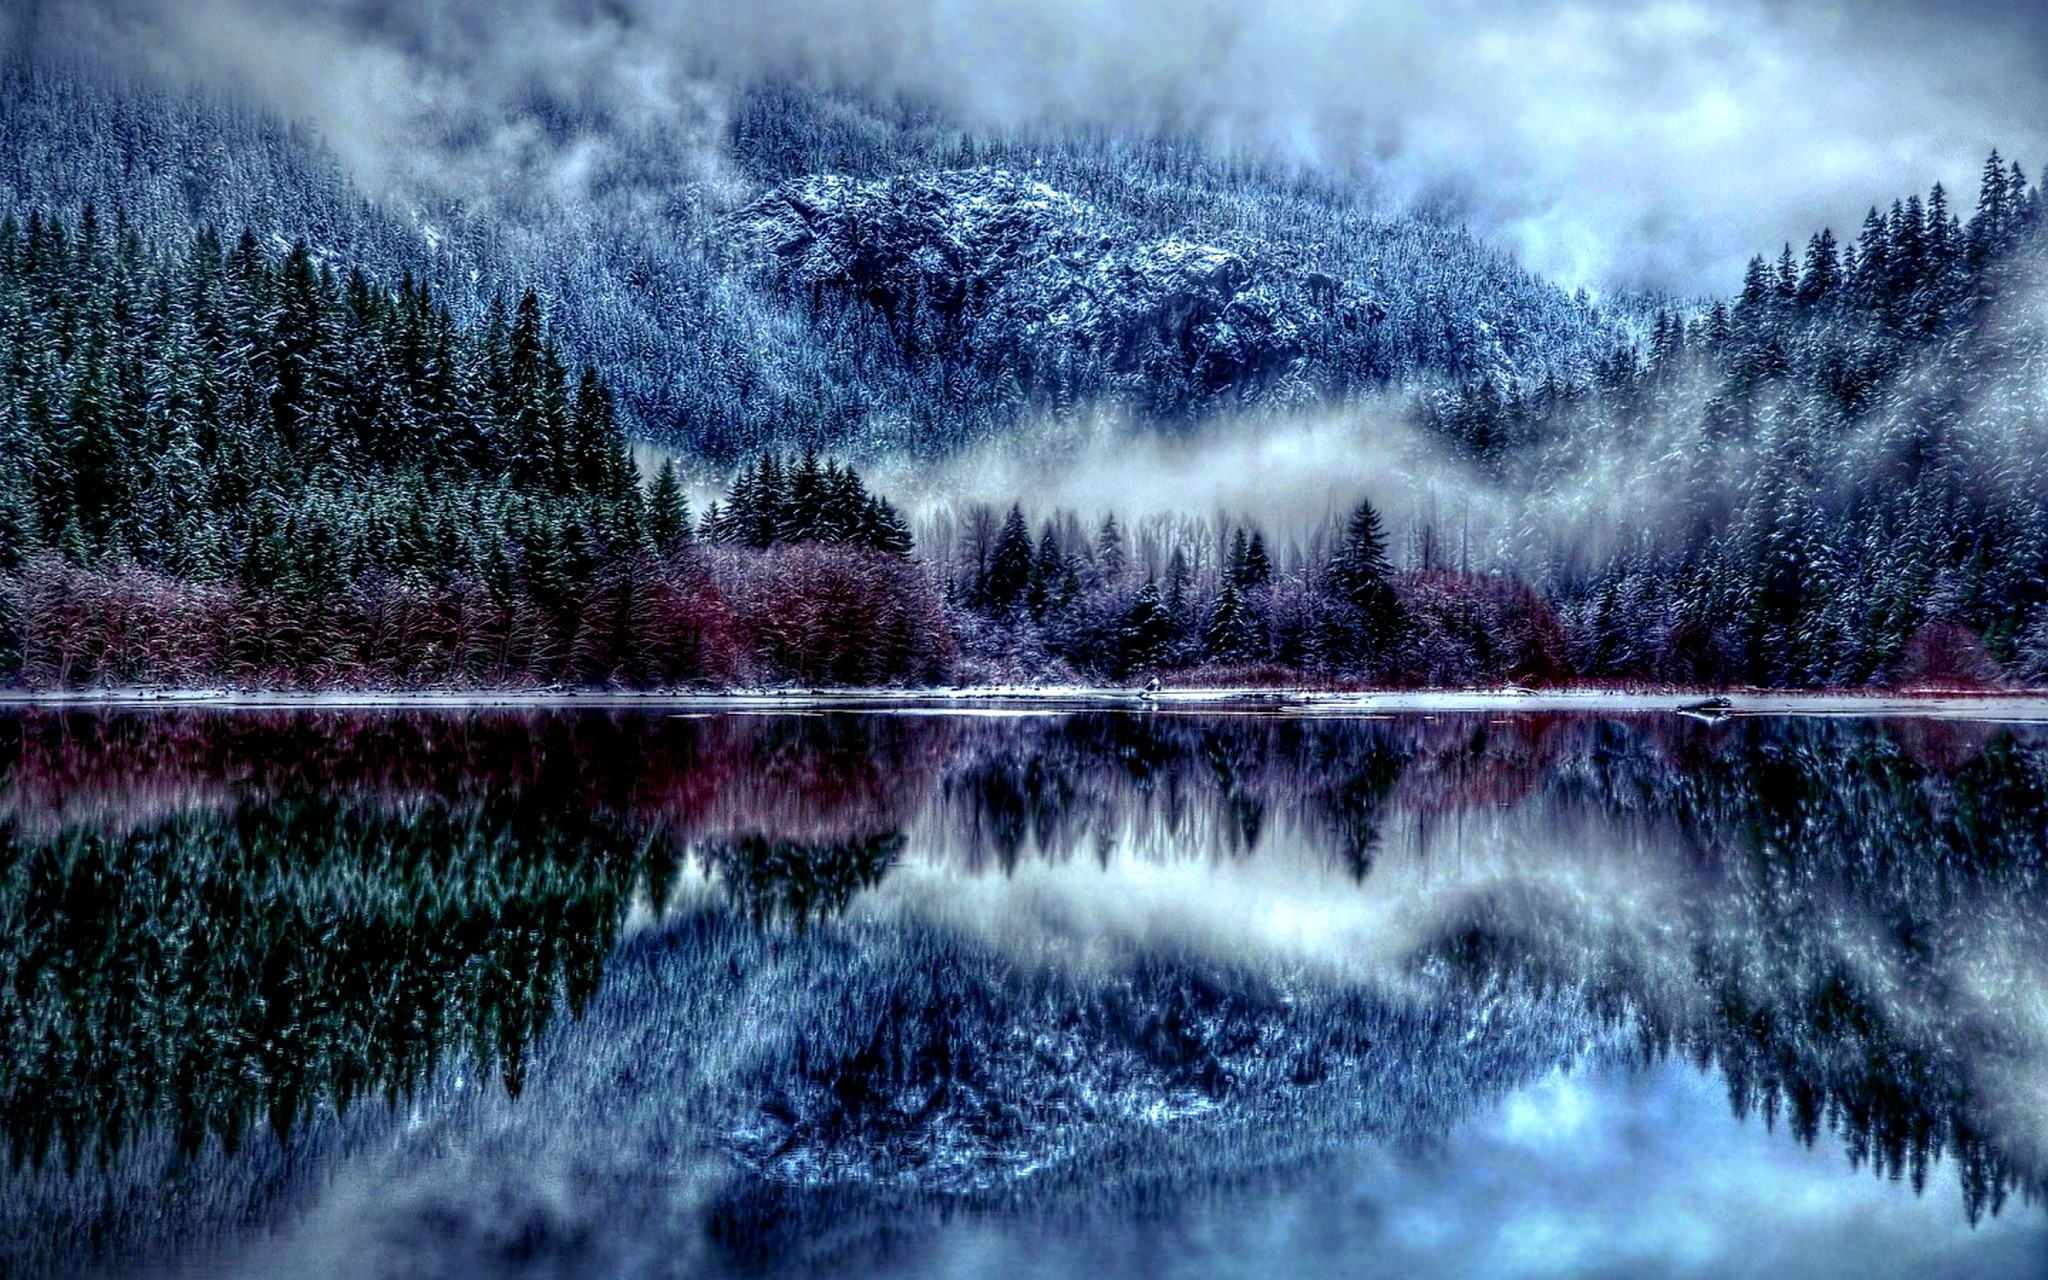 снег горы туман snow mountains fog  № 1146667 бесплатно